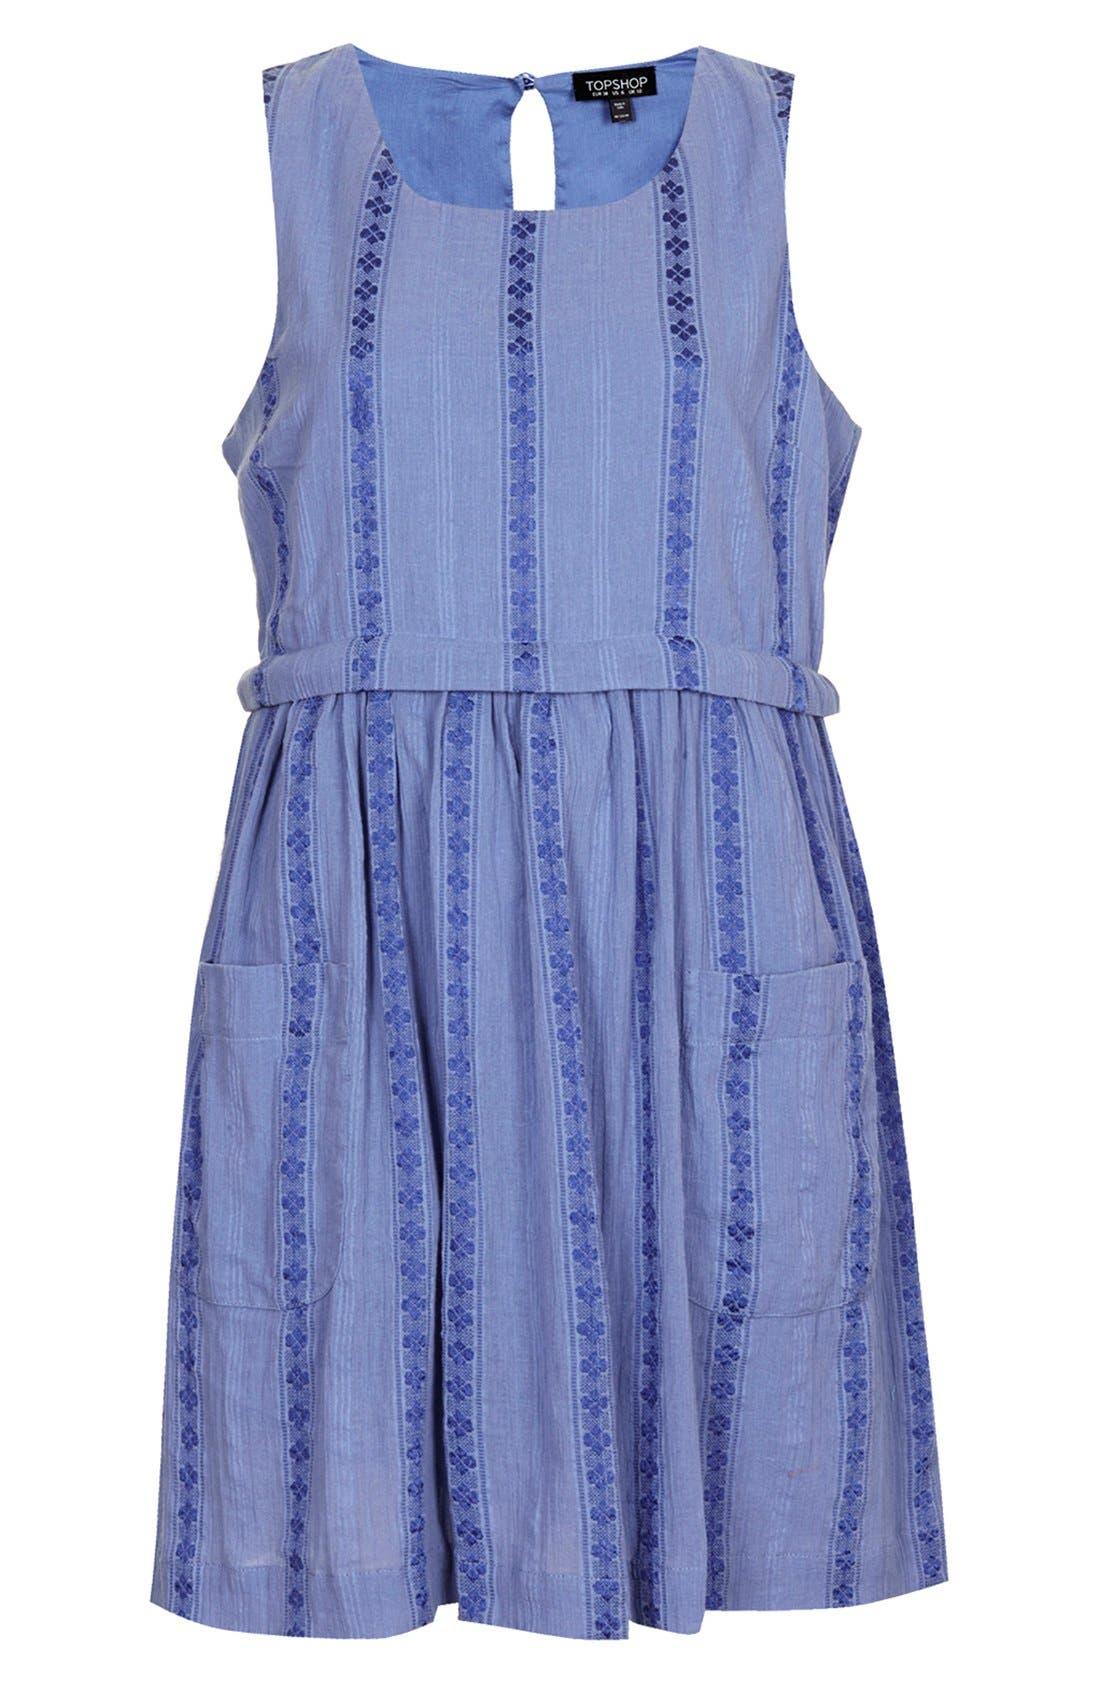 Overlay Tunic Dress,                             Alternate thumbnail 3, color,                             420